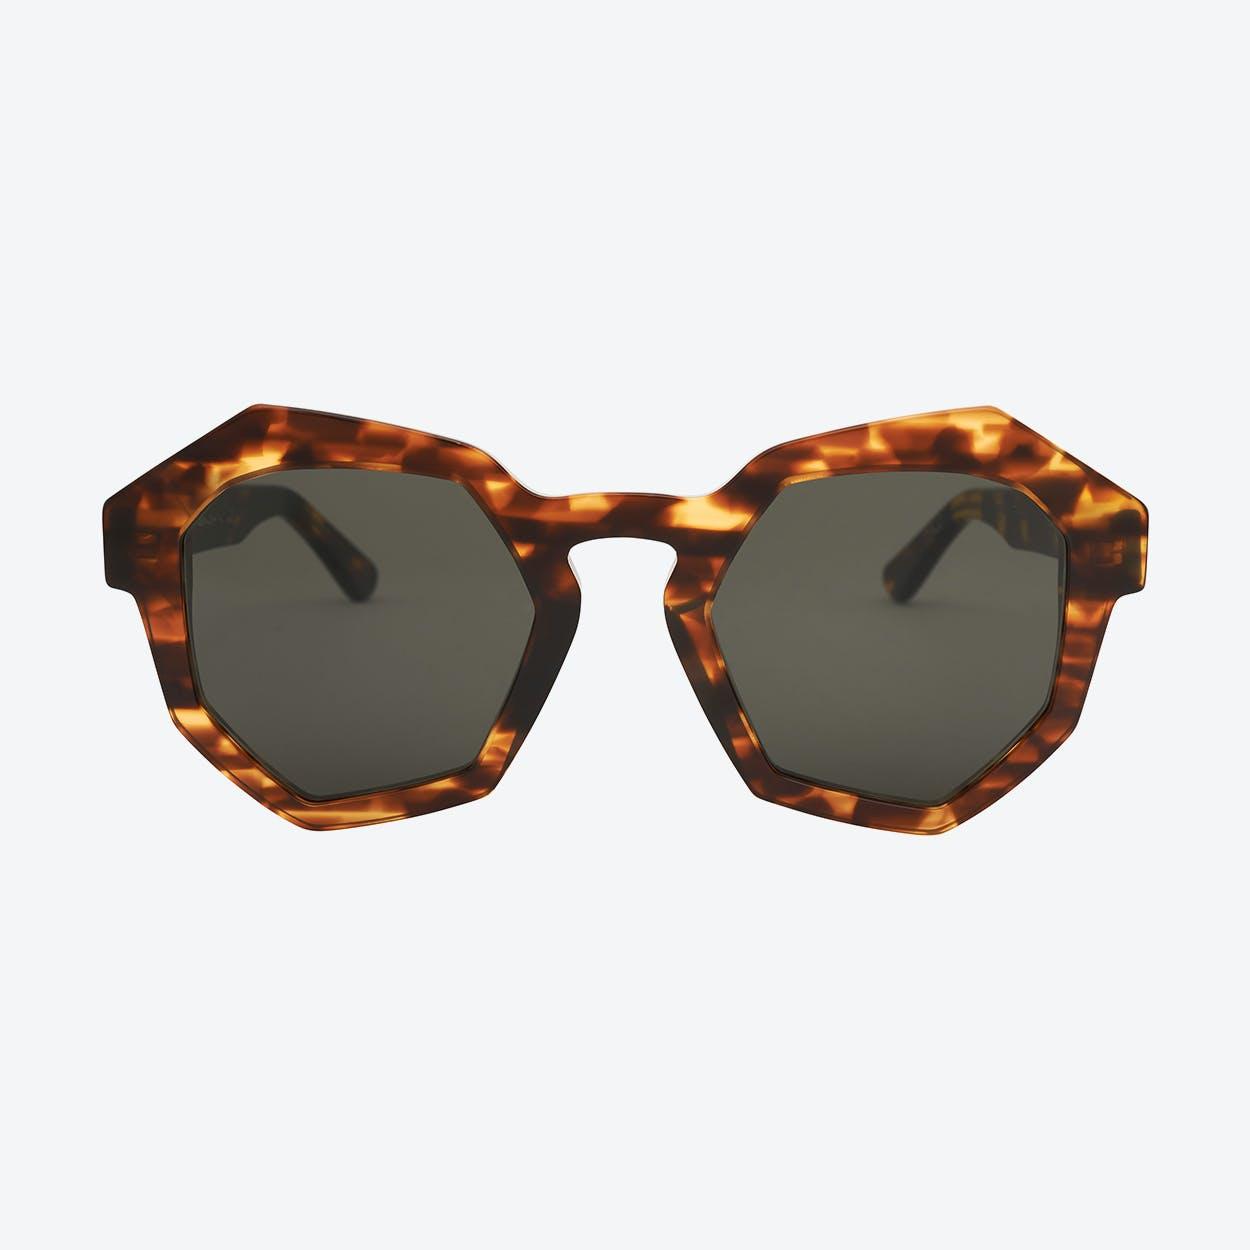 Hoxton Sunglasses in Tortoise